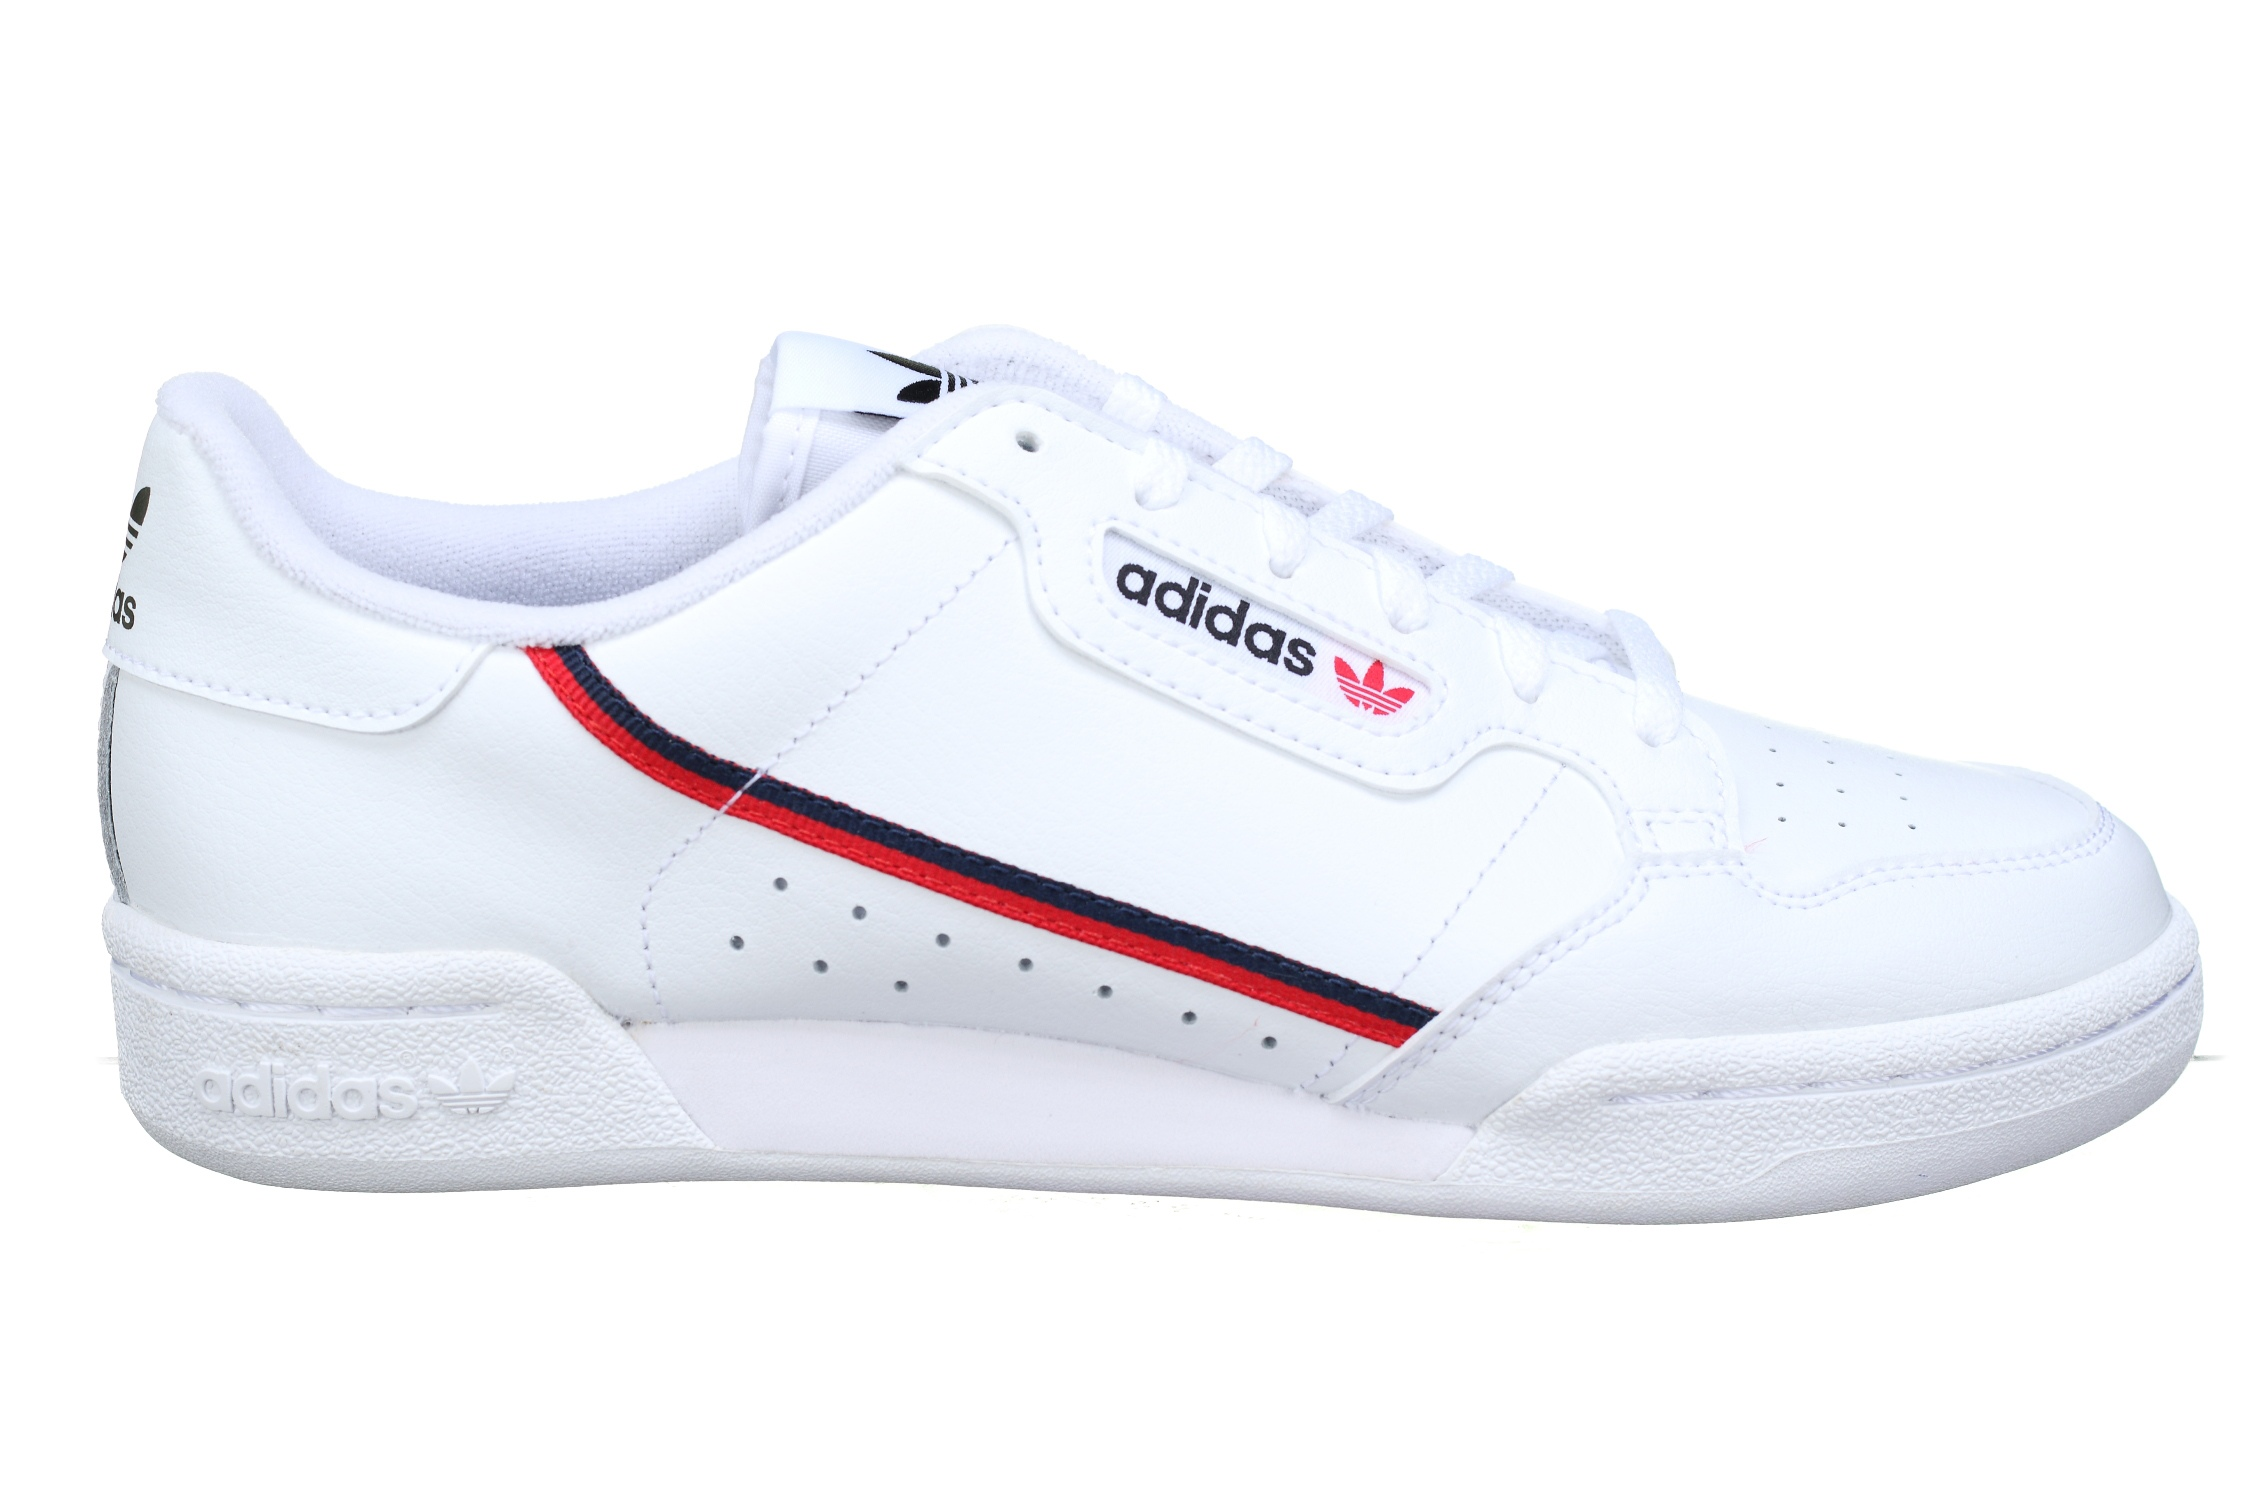 https://www.leadermode.com/162255/adidas-continental-80-j-f99787-white.jpg